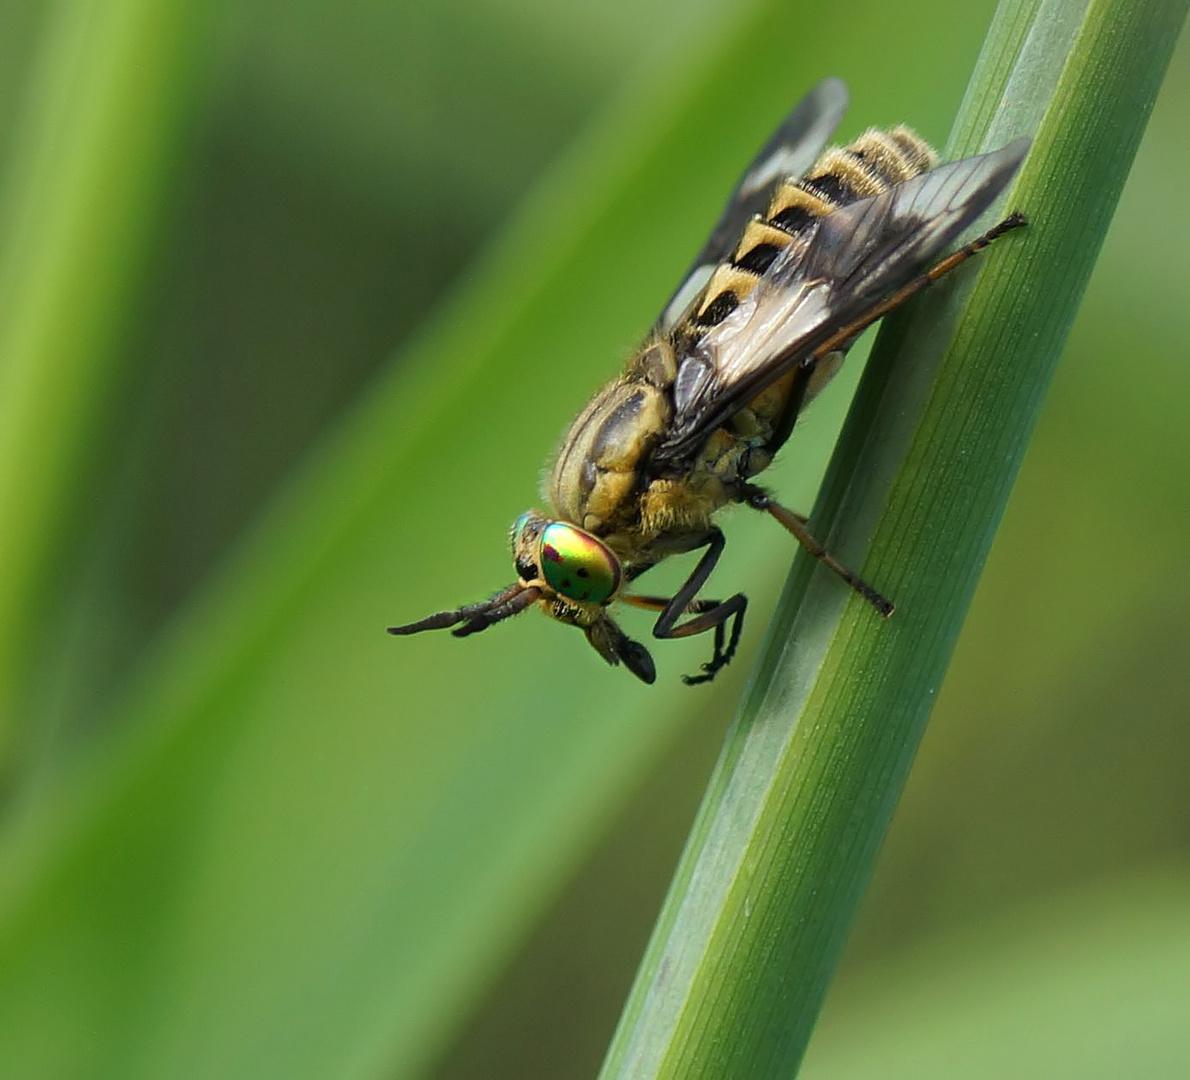 Goldaugenbremse (Chrysops relictus)